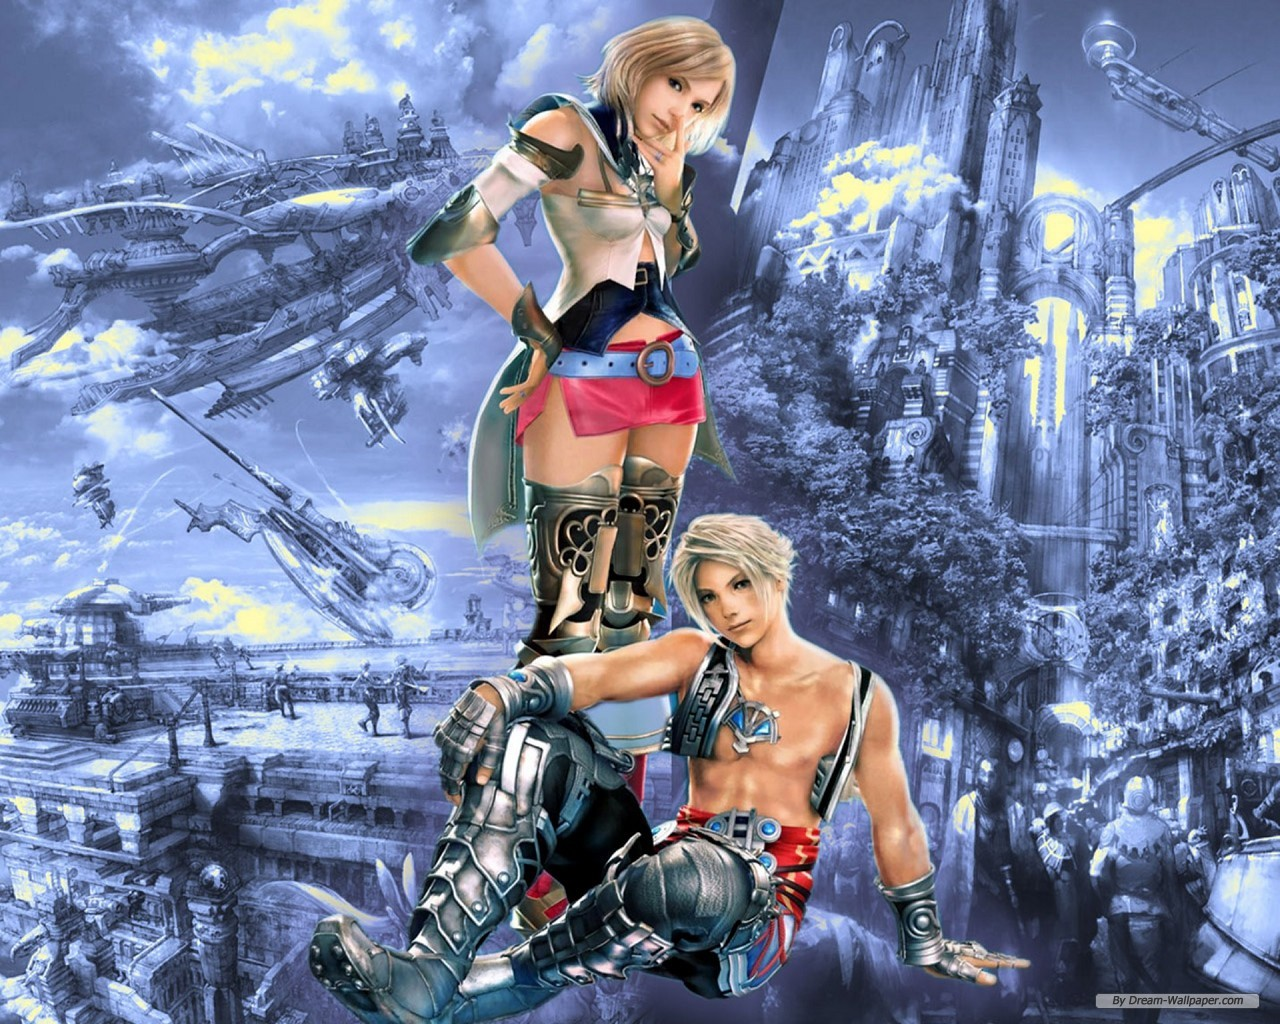 Game wallpaper   Cute Game Girl wallpaper   1280x1024 wallpaper 1280x1024